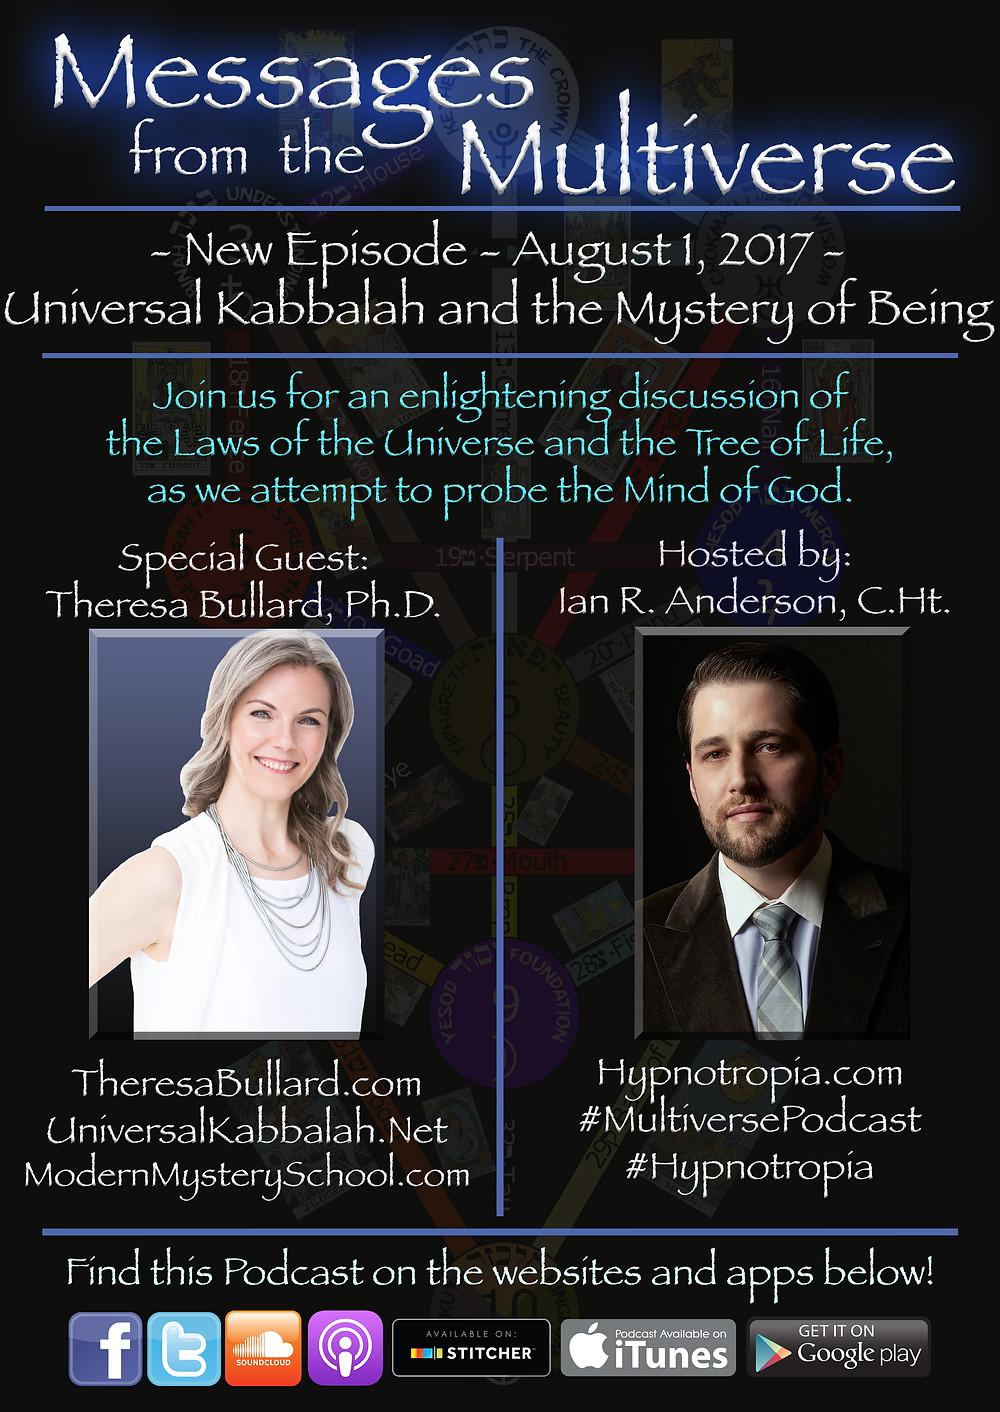 Universal Kabbalah - Dr. Theresa Bullard